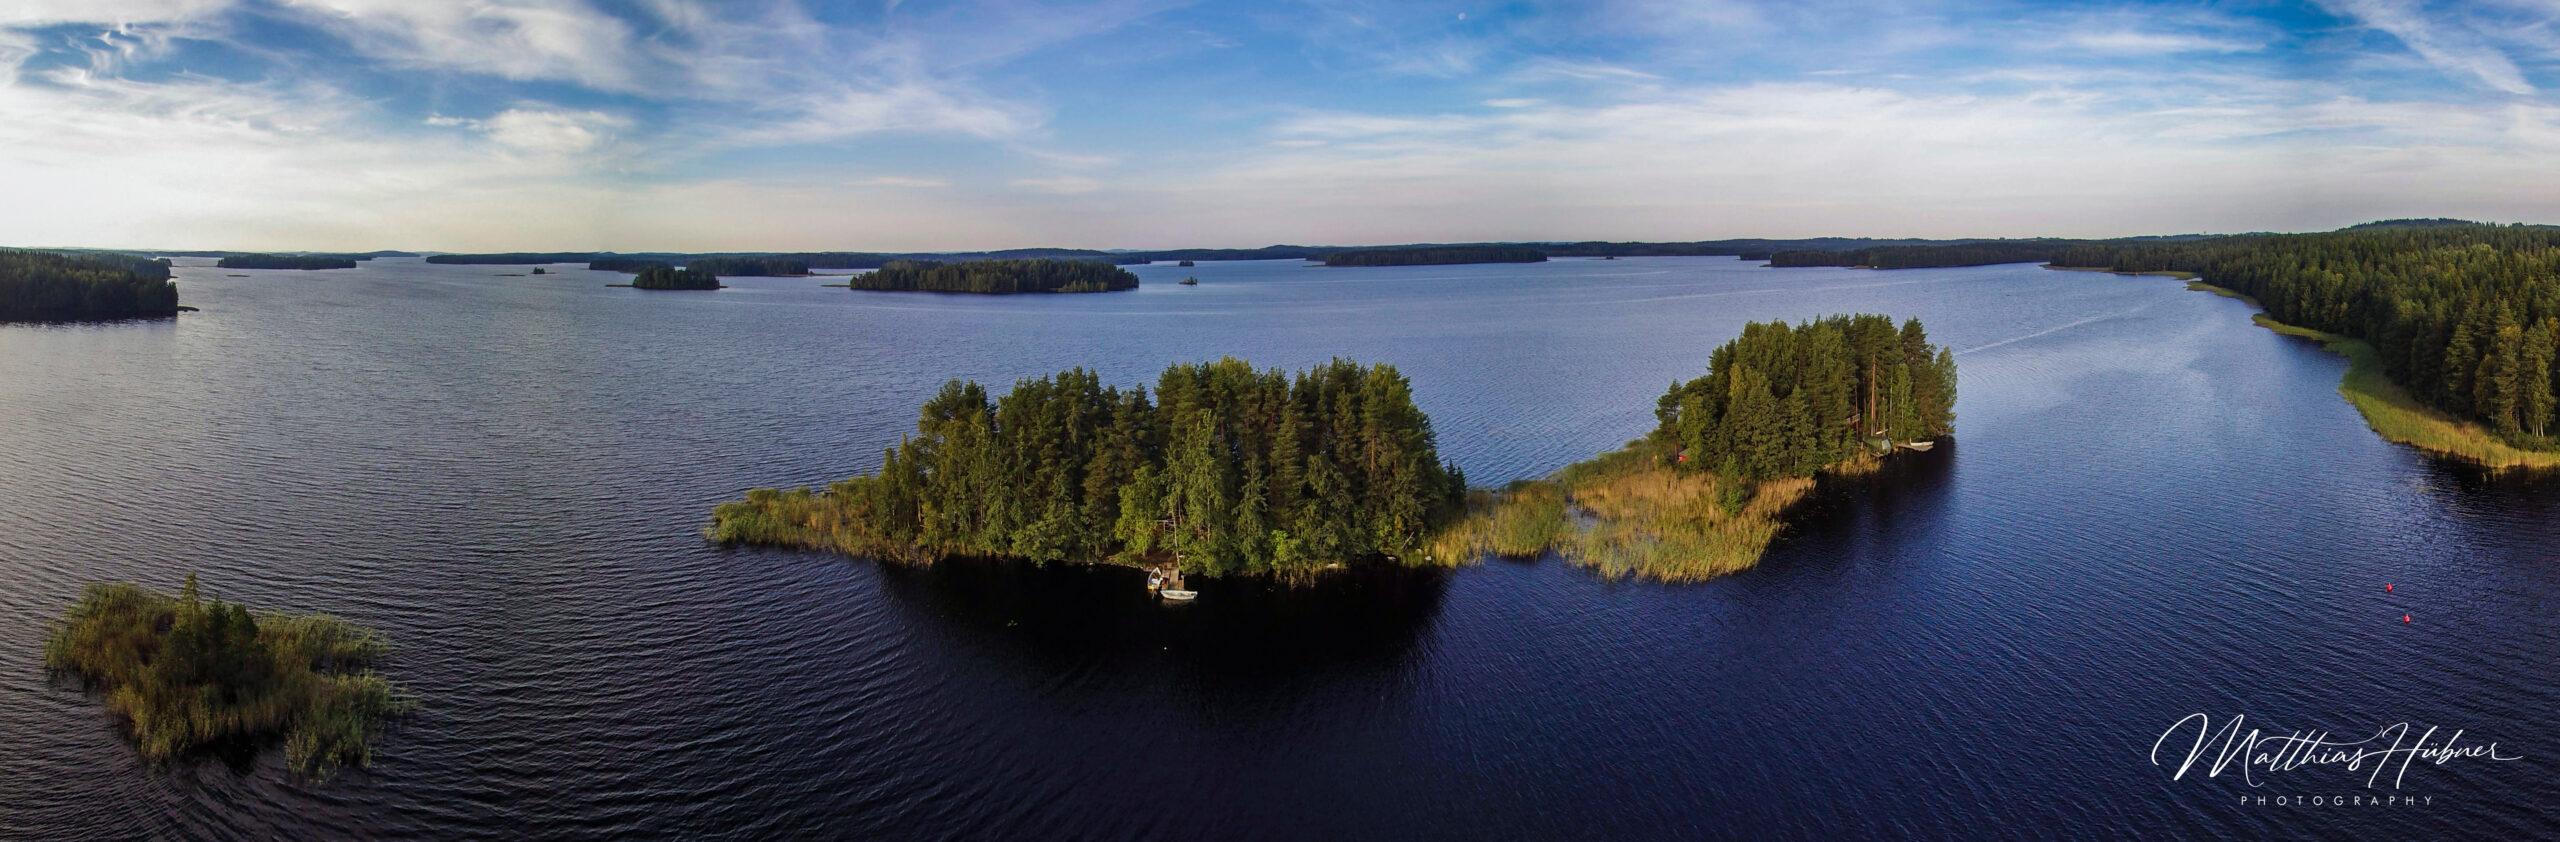 Muuttosaaret Savo Finland Panorama huebner photography